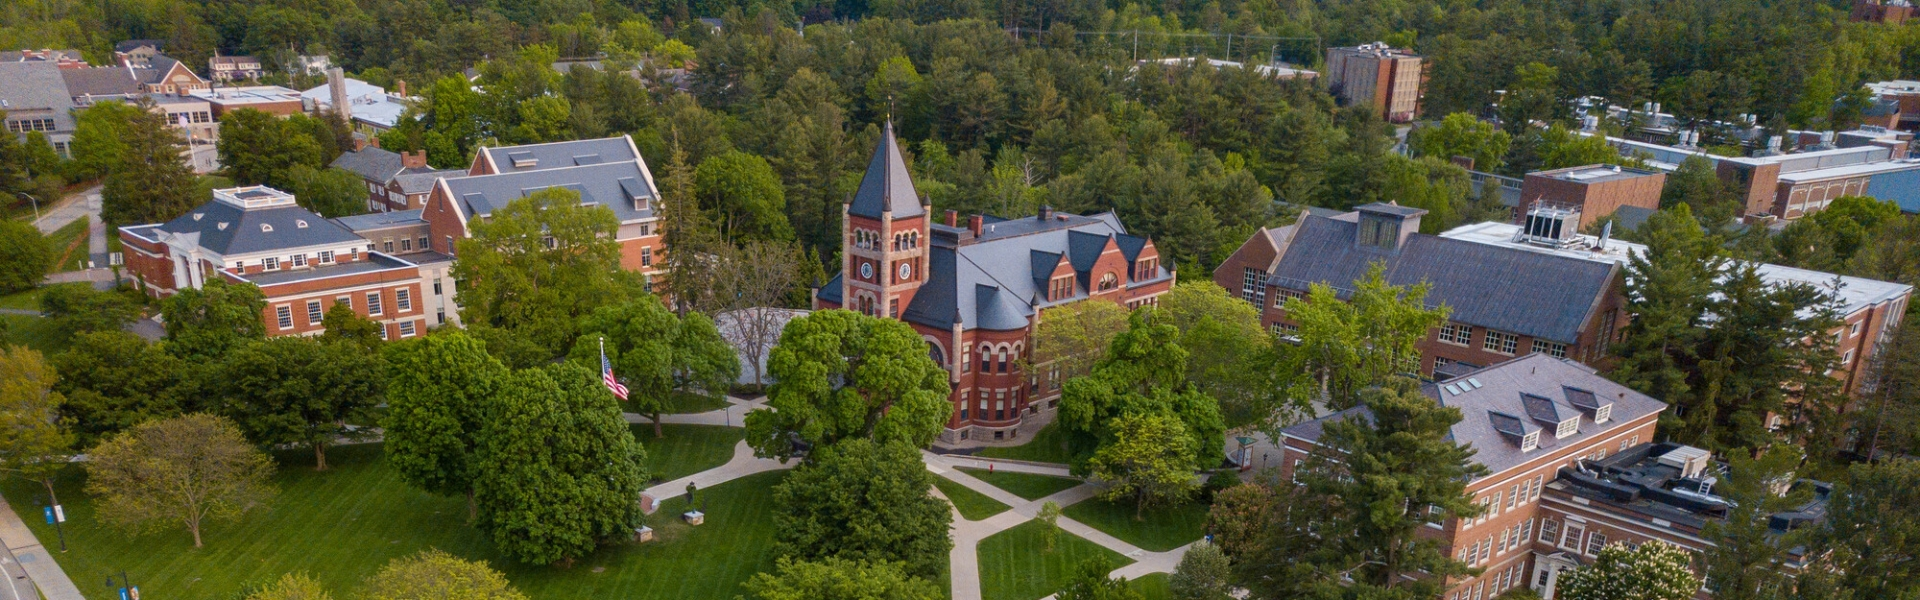 UNH campus aerial image